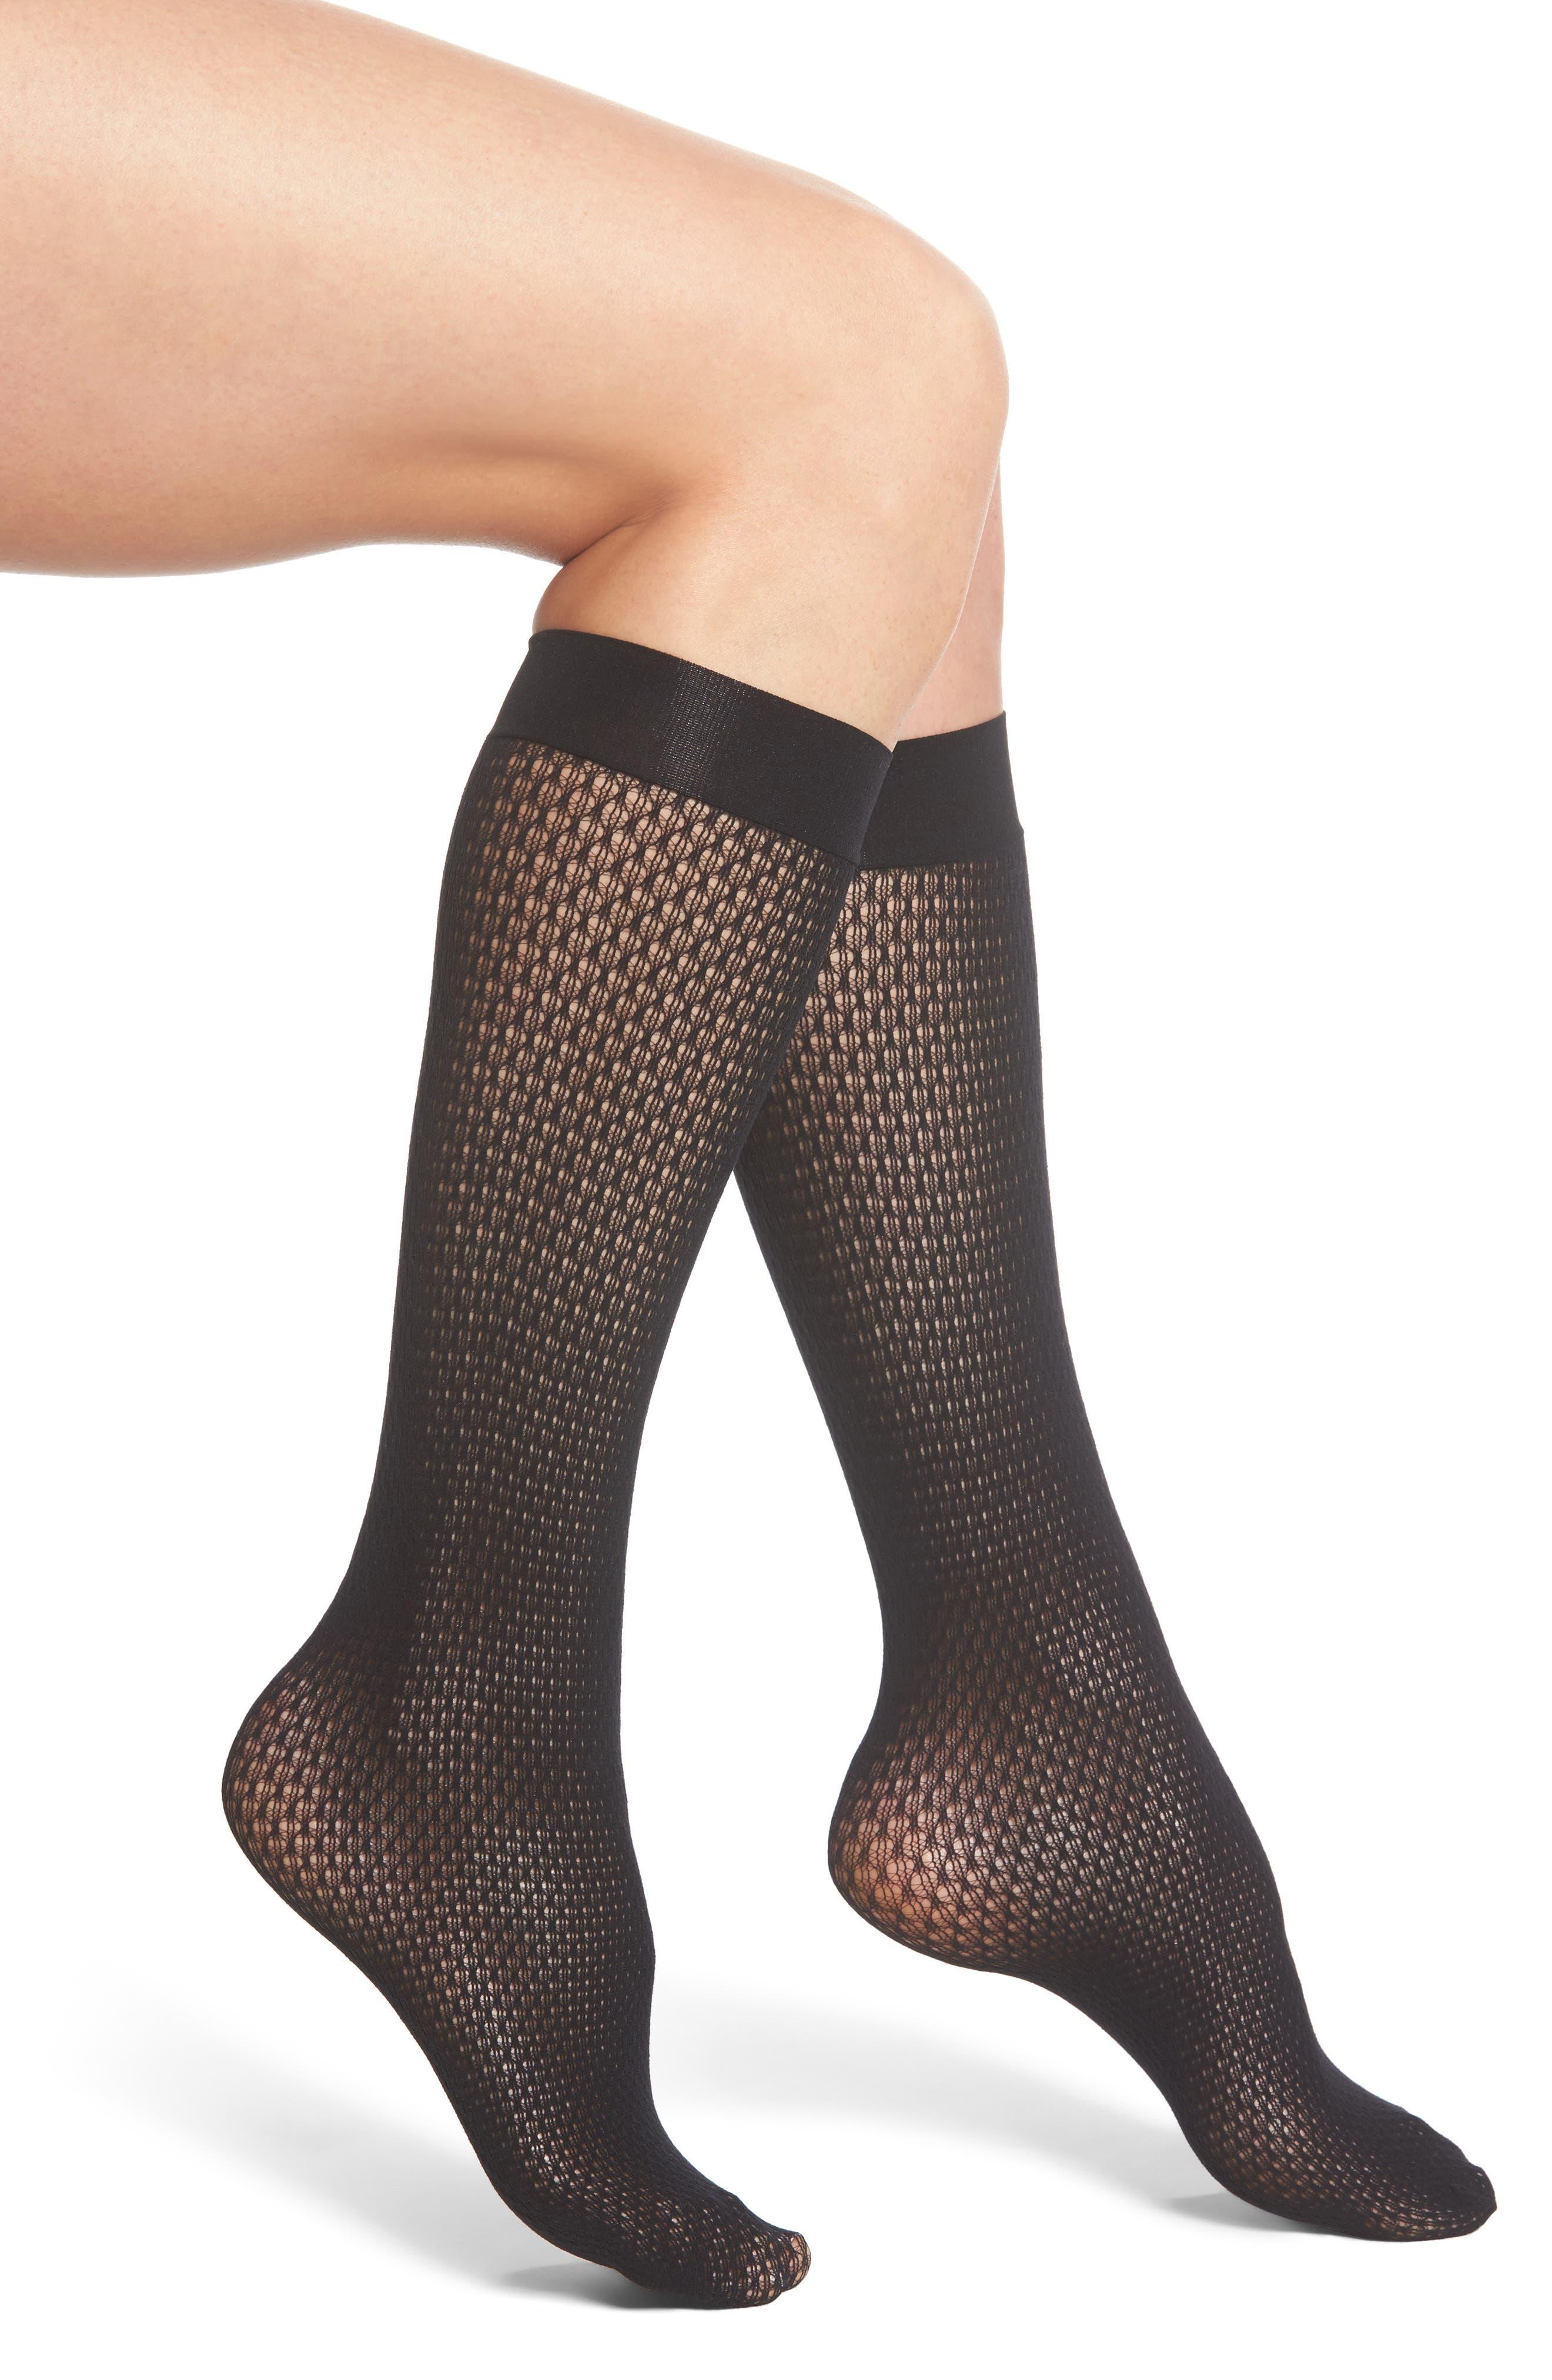 Rhomb Net Knee High Stockings,                         Main,                         color,